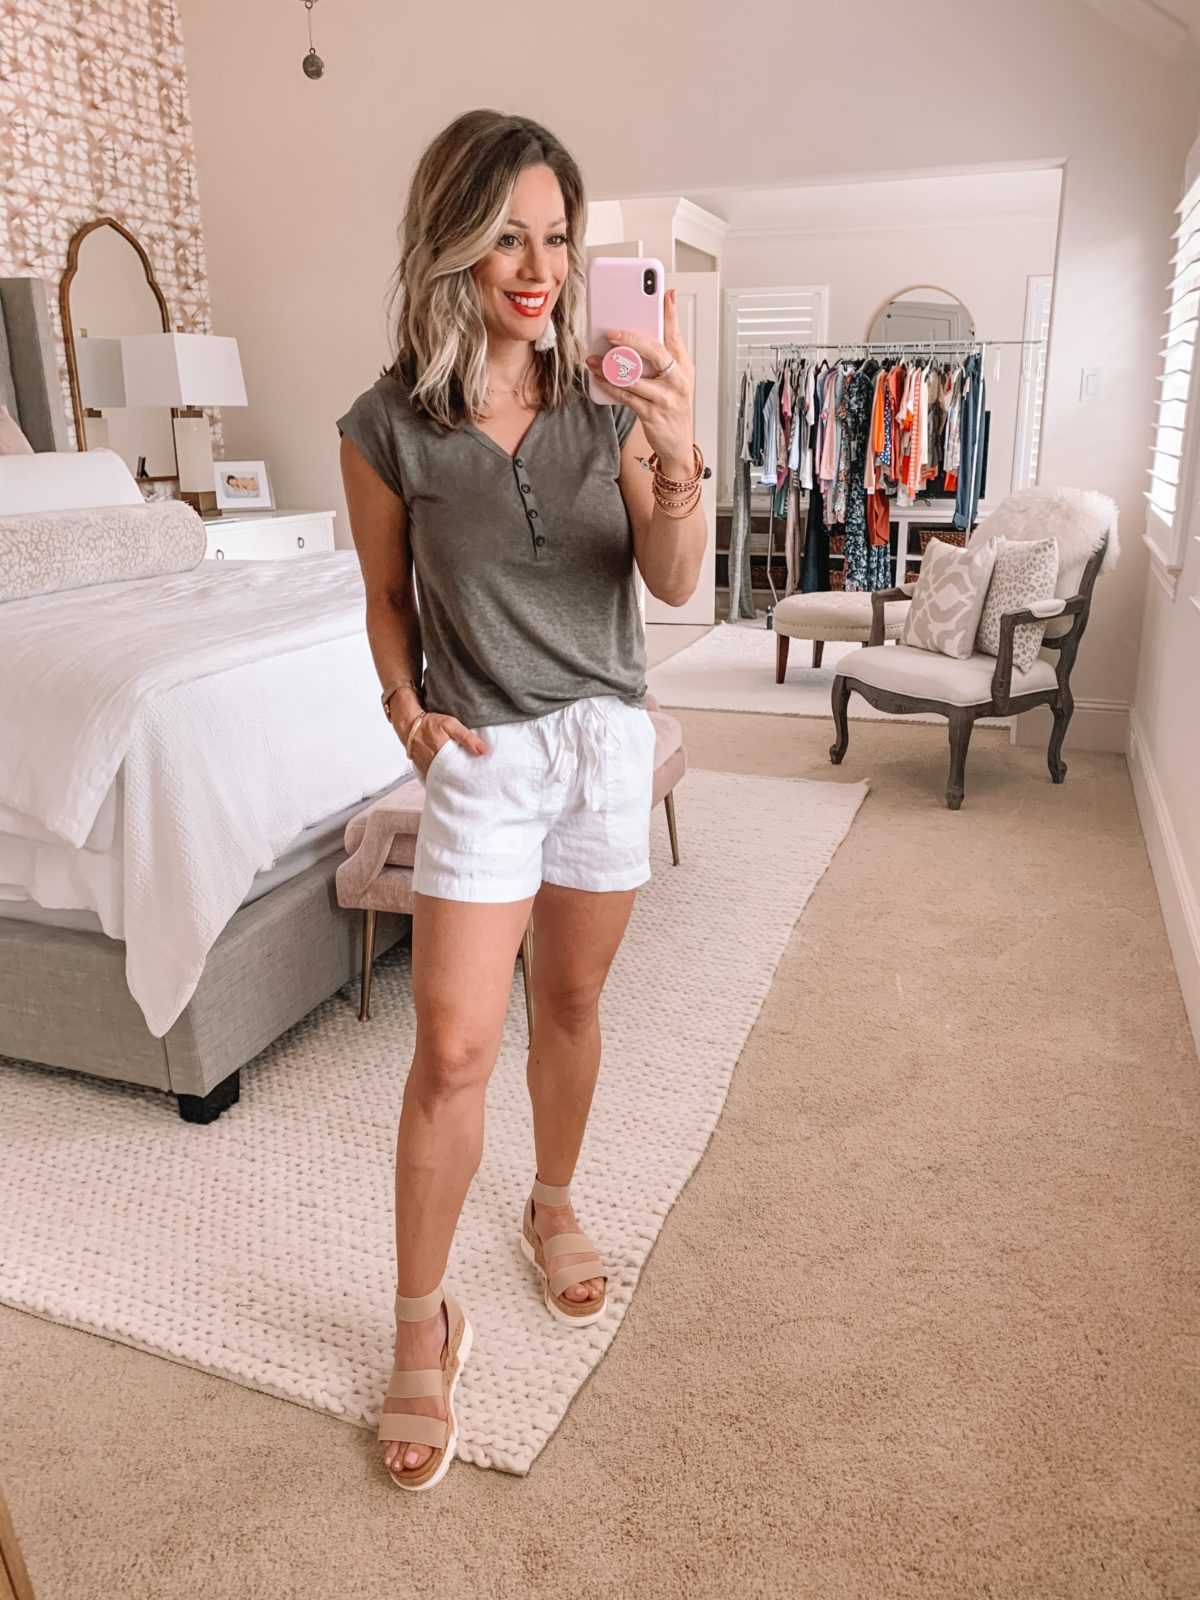 Dressing Room Nordstrom & LOFT, Henley Tee, Linen Shorts, Platform Sandals